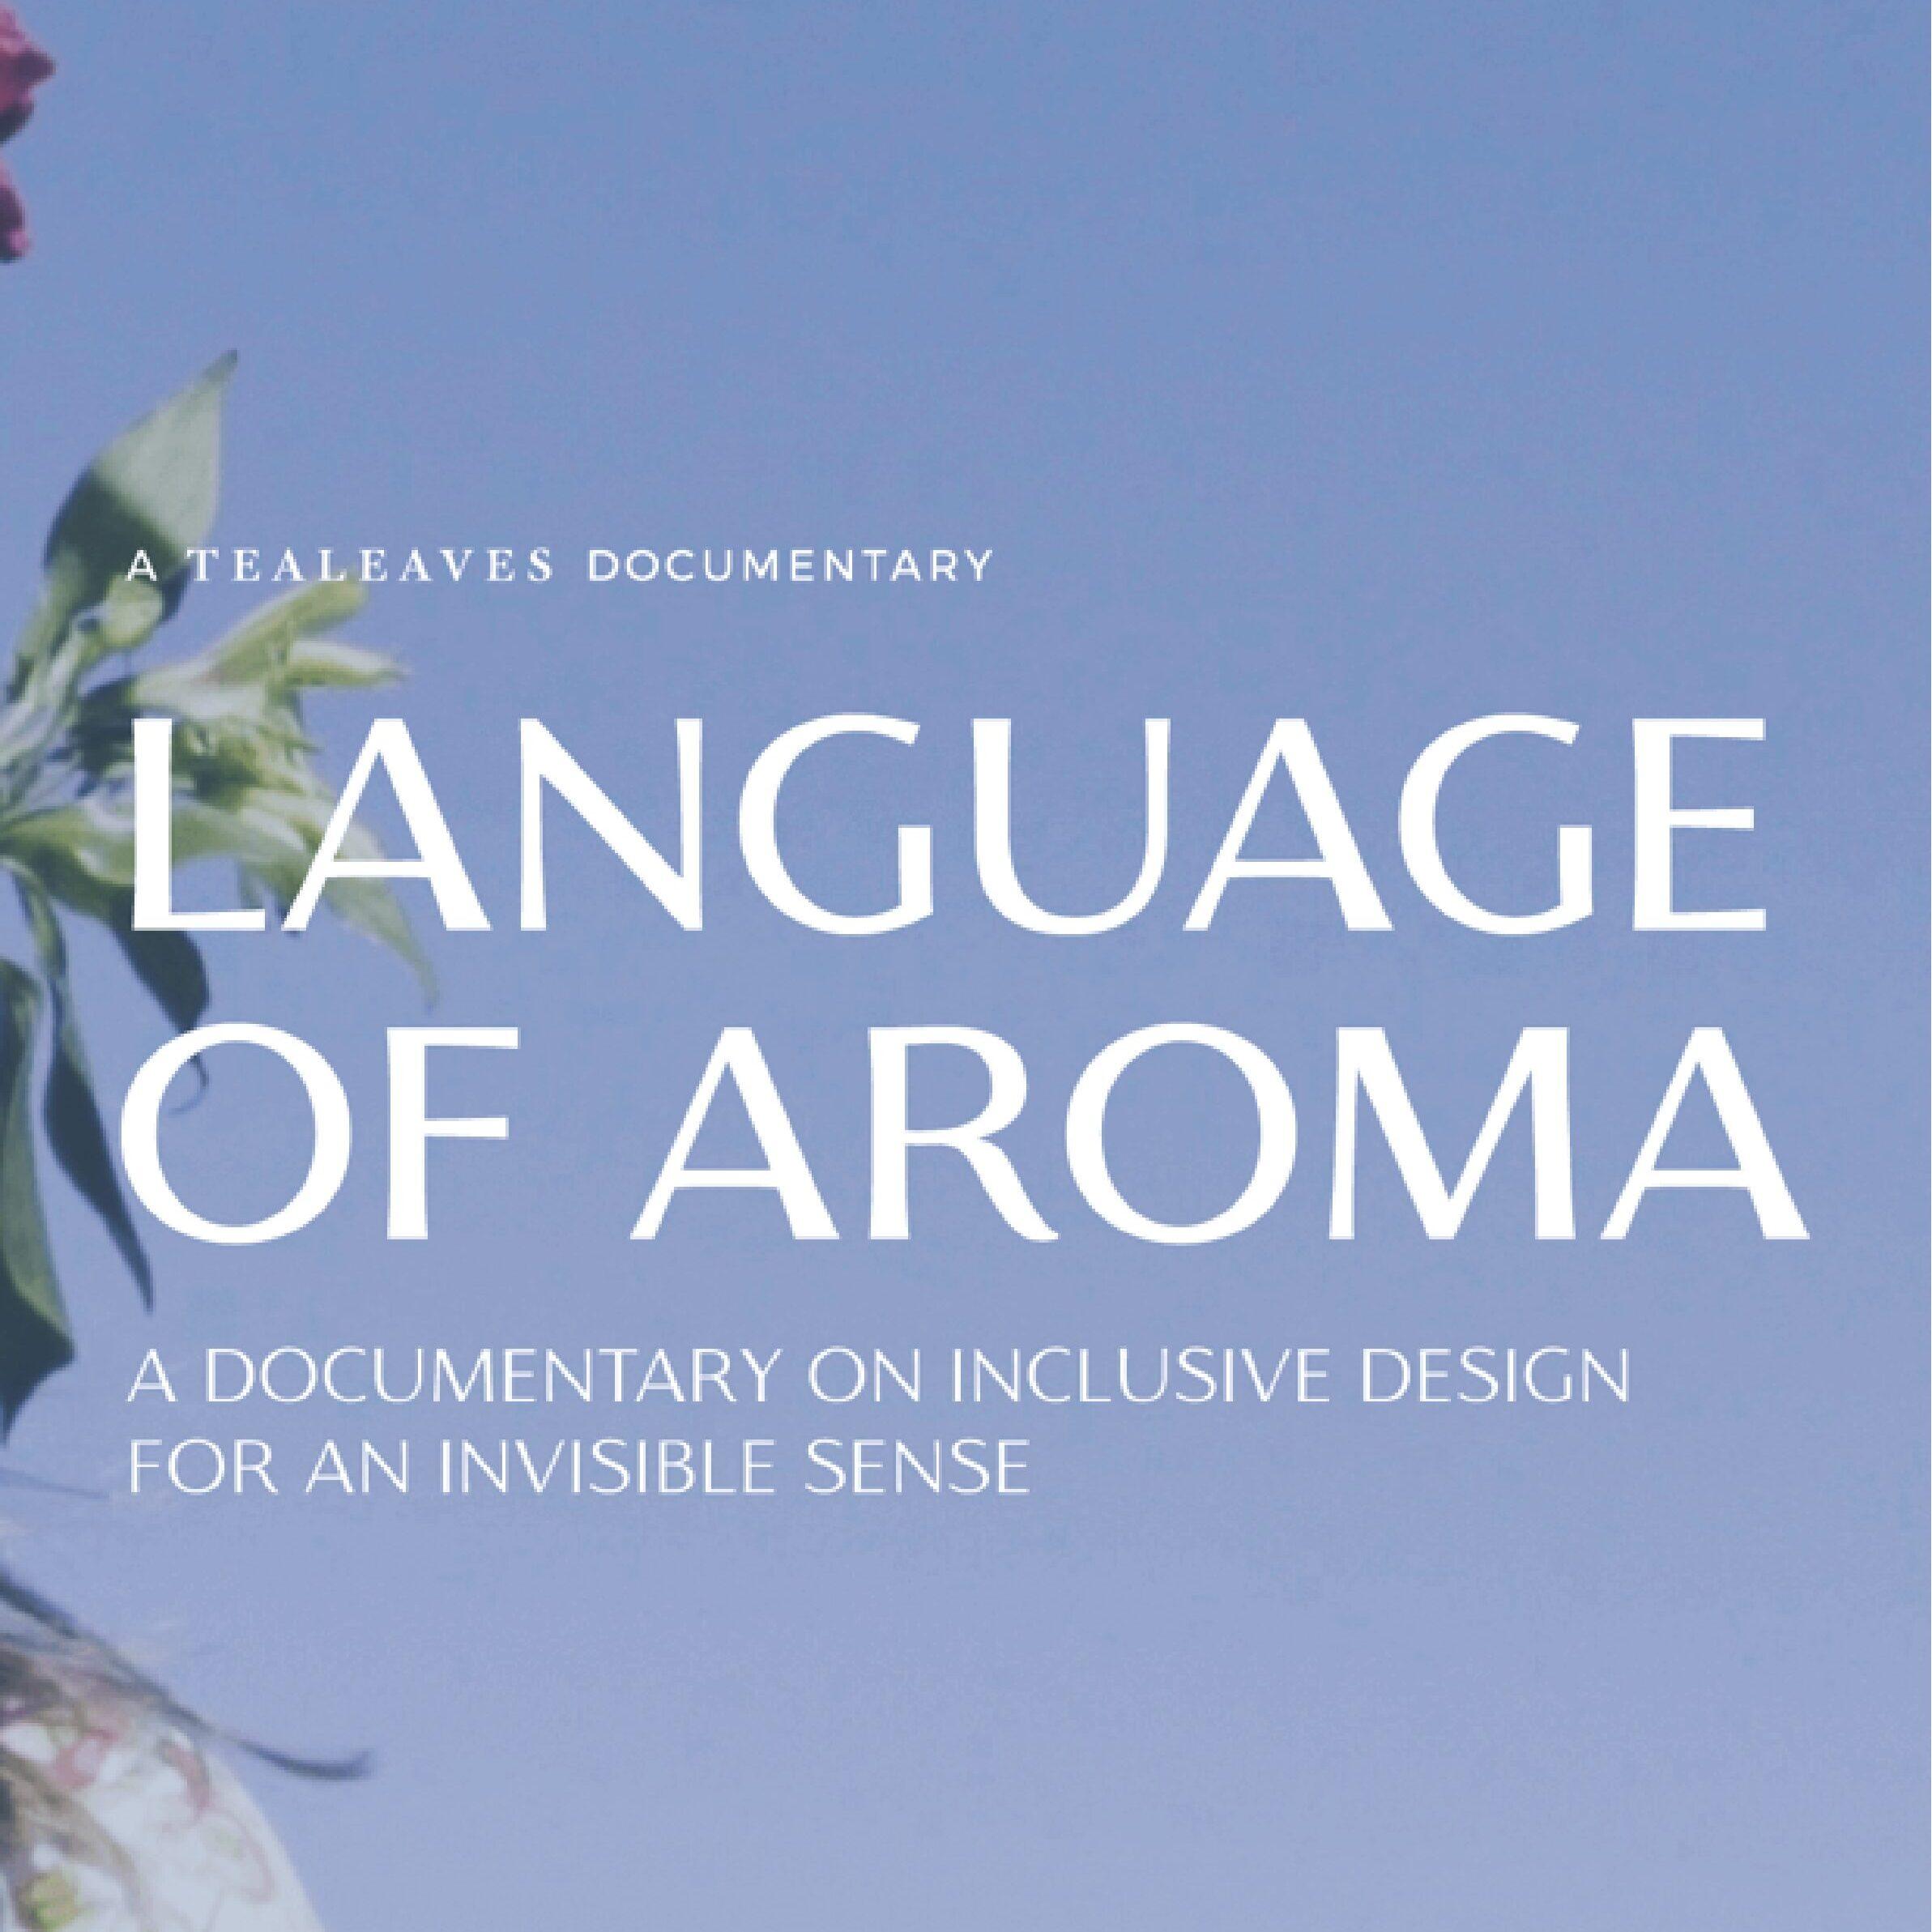 Language of aroma